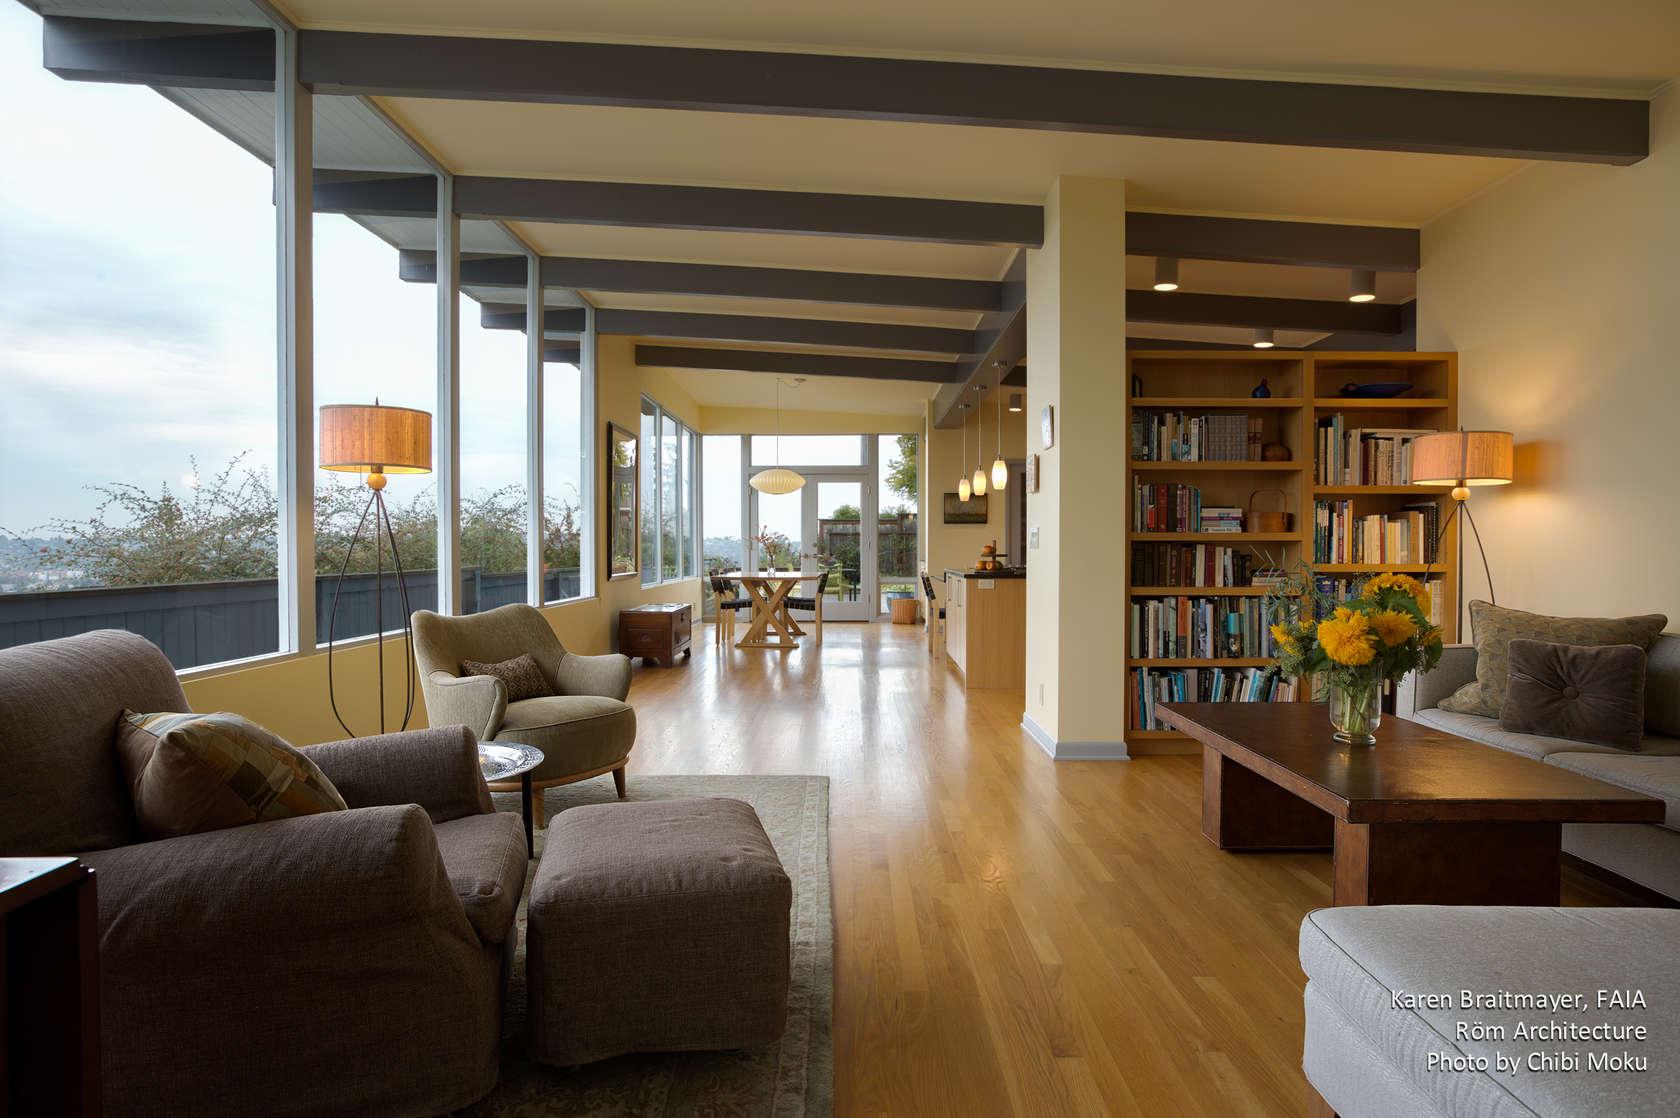 Rom Architecture Karen Braitmayer MidCentury Modern Seattle